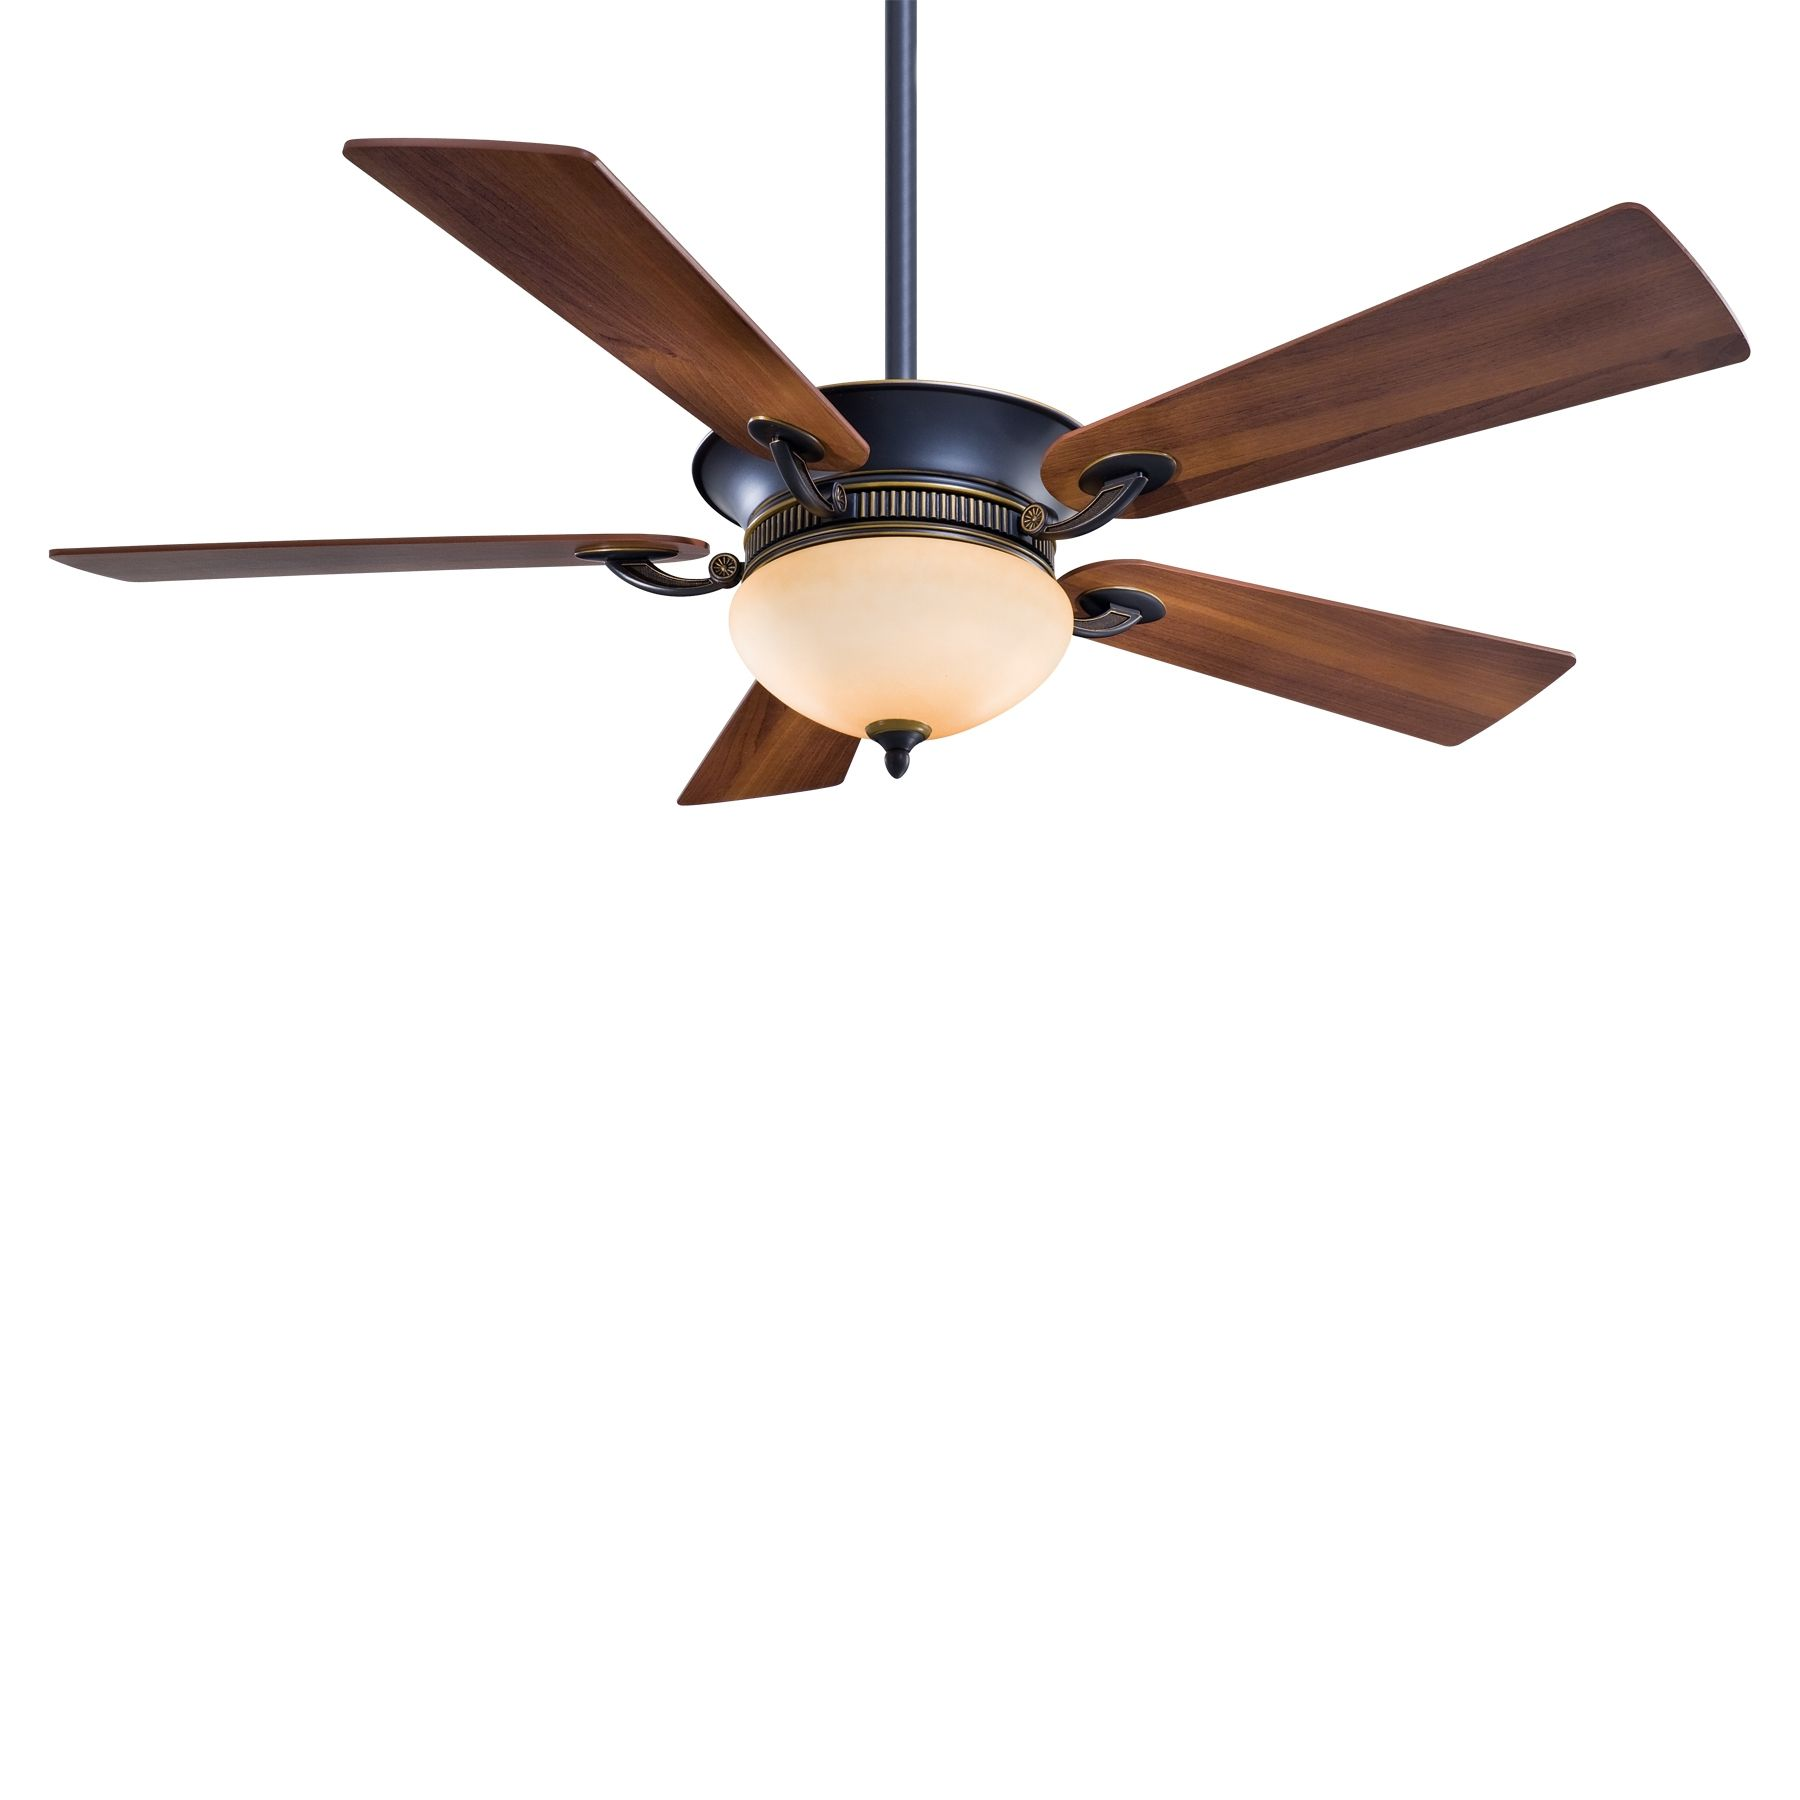 Minka Aire Ceiling Fans Change Light Bulb